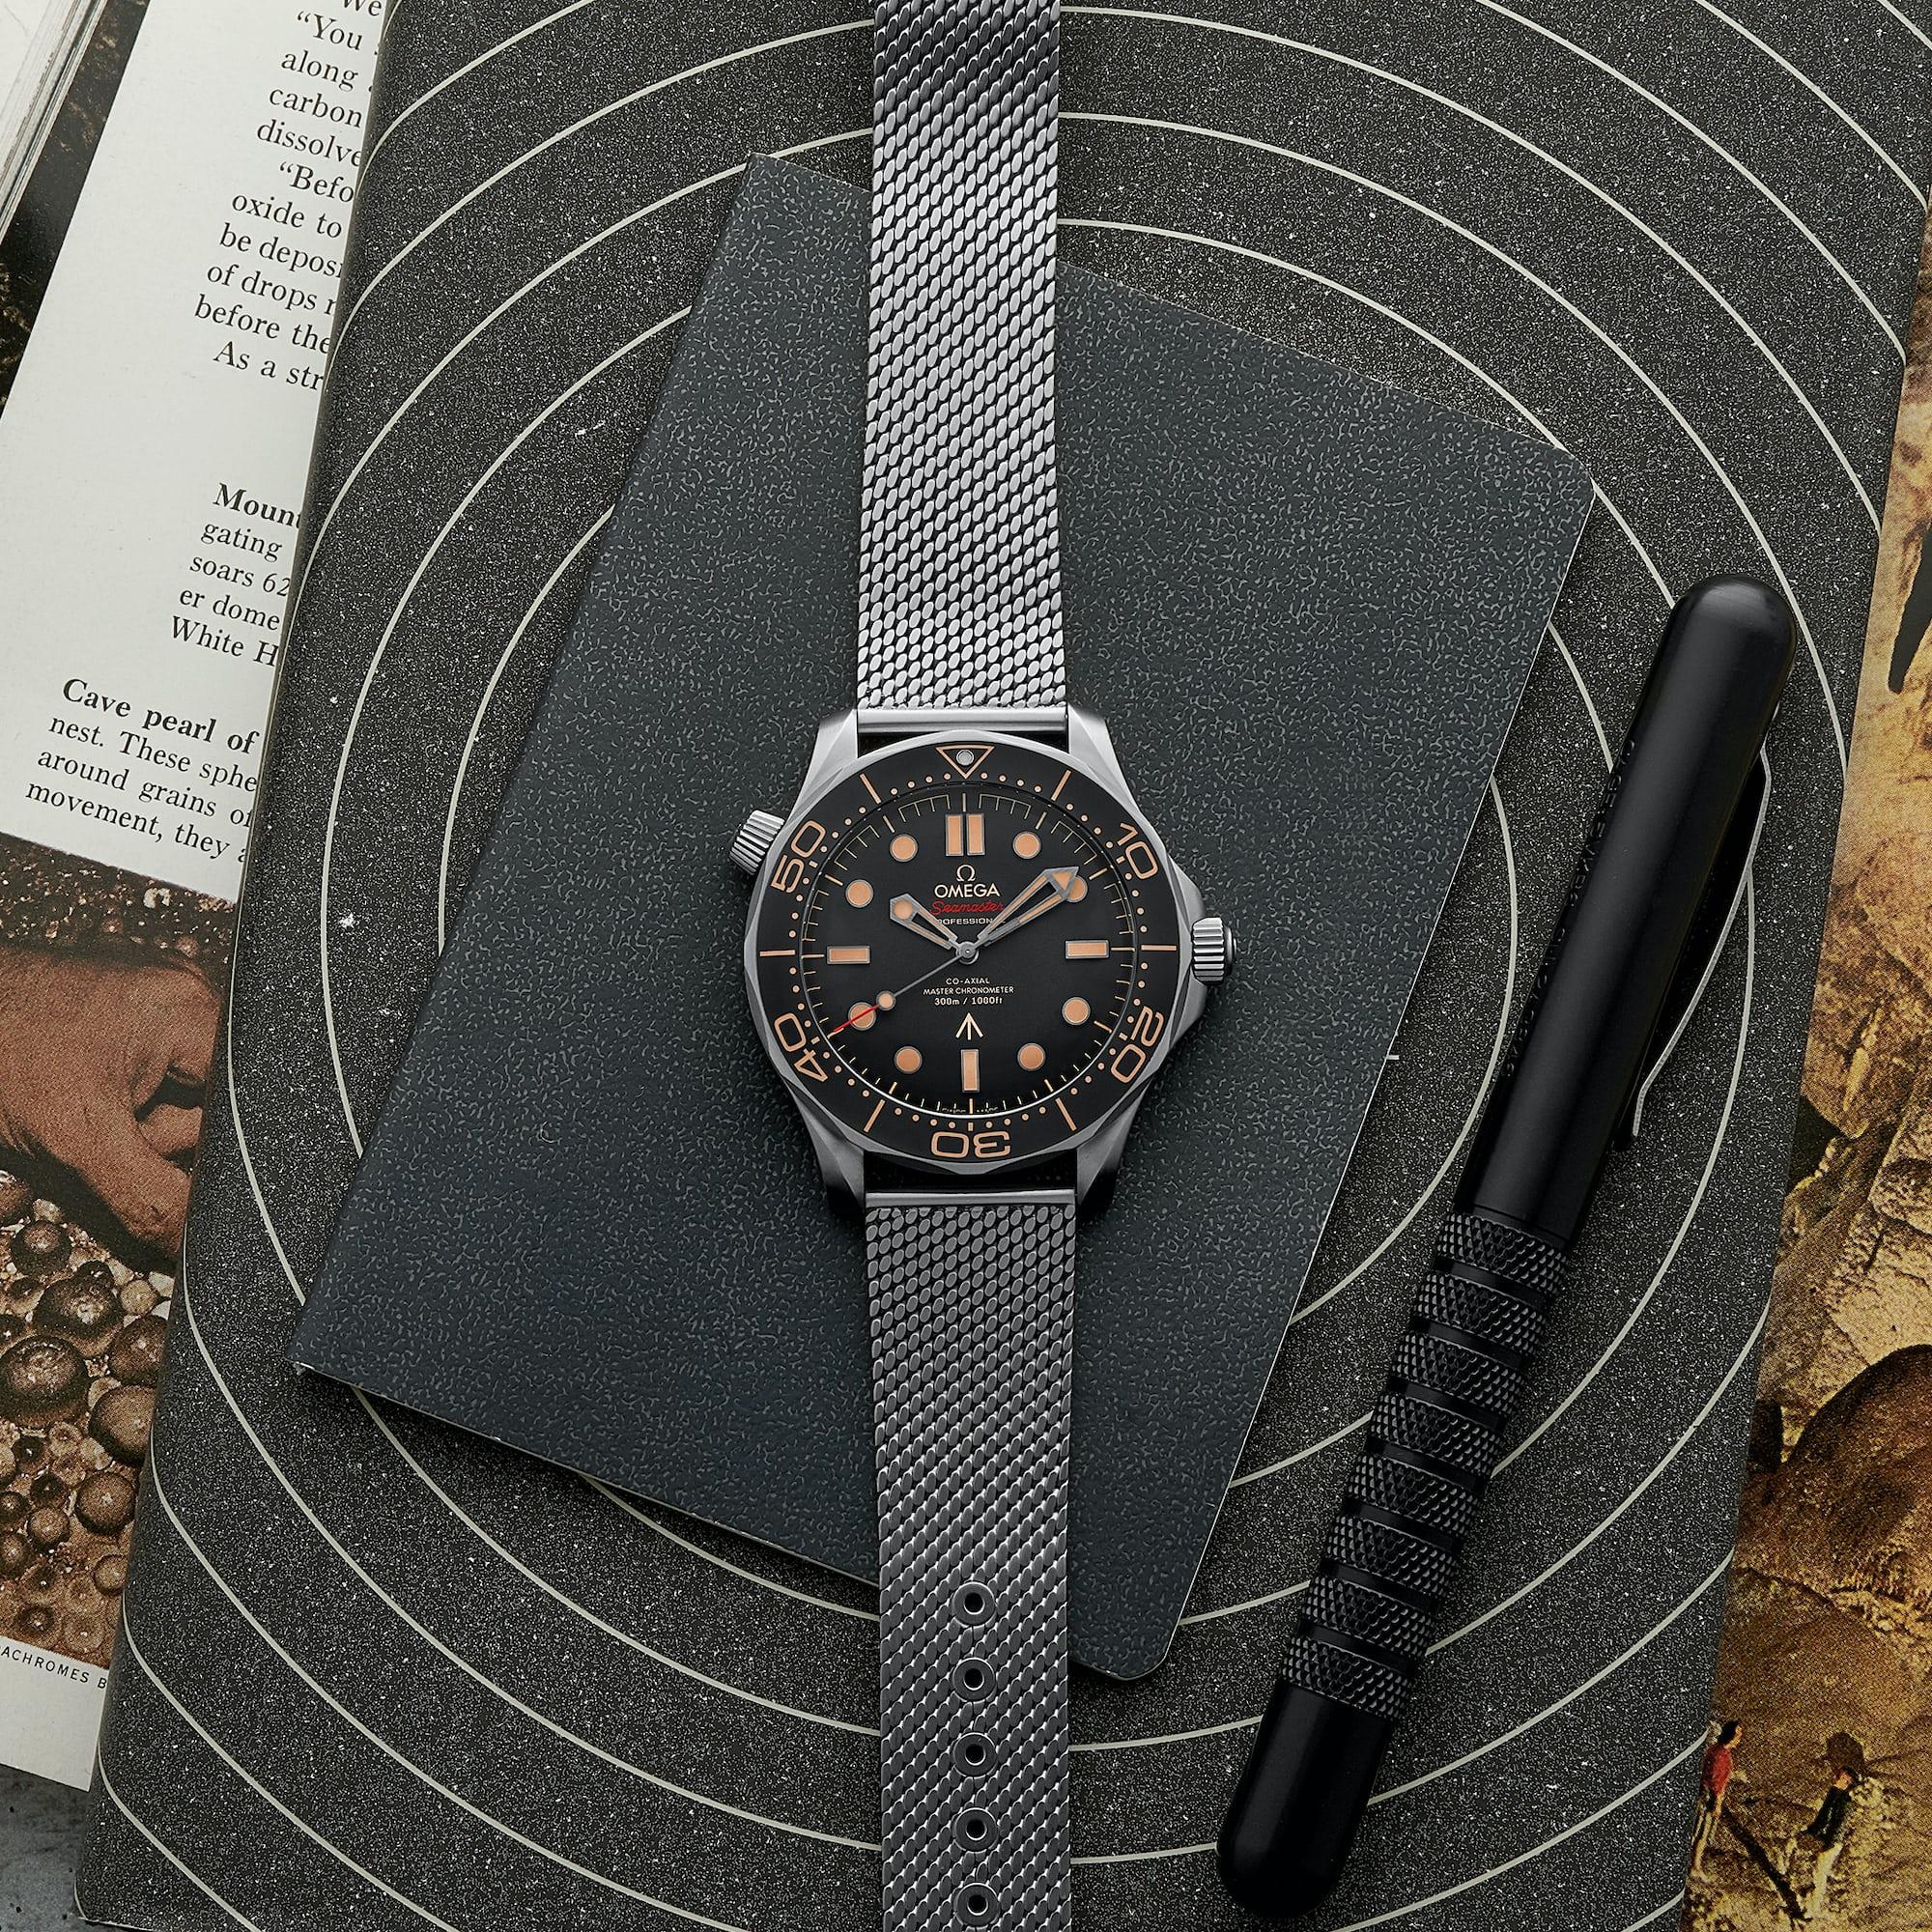 "<p><a href=""https://shop.hodinkee.com/collections/omega/products/omega-seamaster-diver-300m-co-axial-master-chronometer-42mm-titanium-007-edition-bracelet?variant=31745136623691"" rel=""noopener"" target=""_blank""><u>OMEGA Seamaster Diver 300M Co-Axial Master Chronometer 42mm Titanium 007 Edition</u></a></p>"